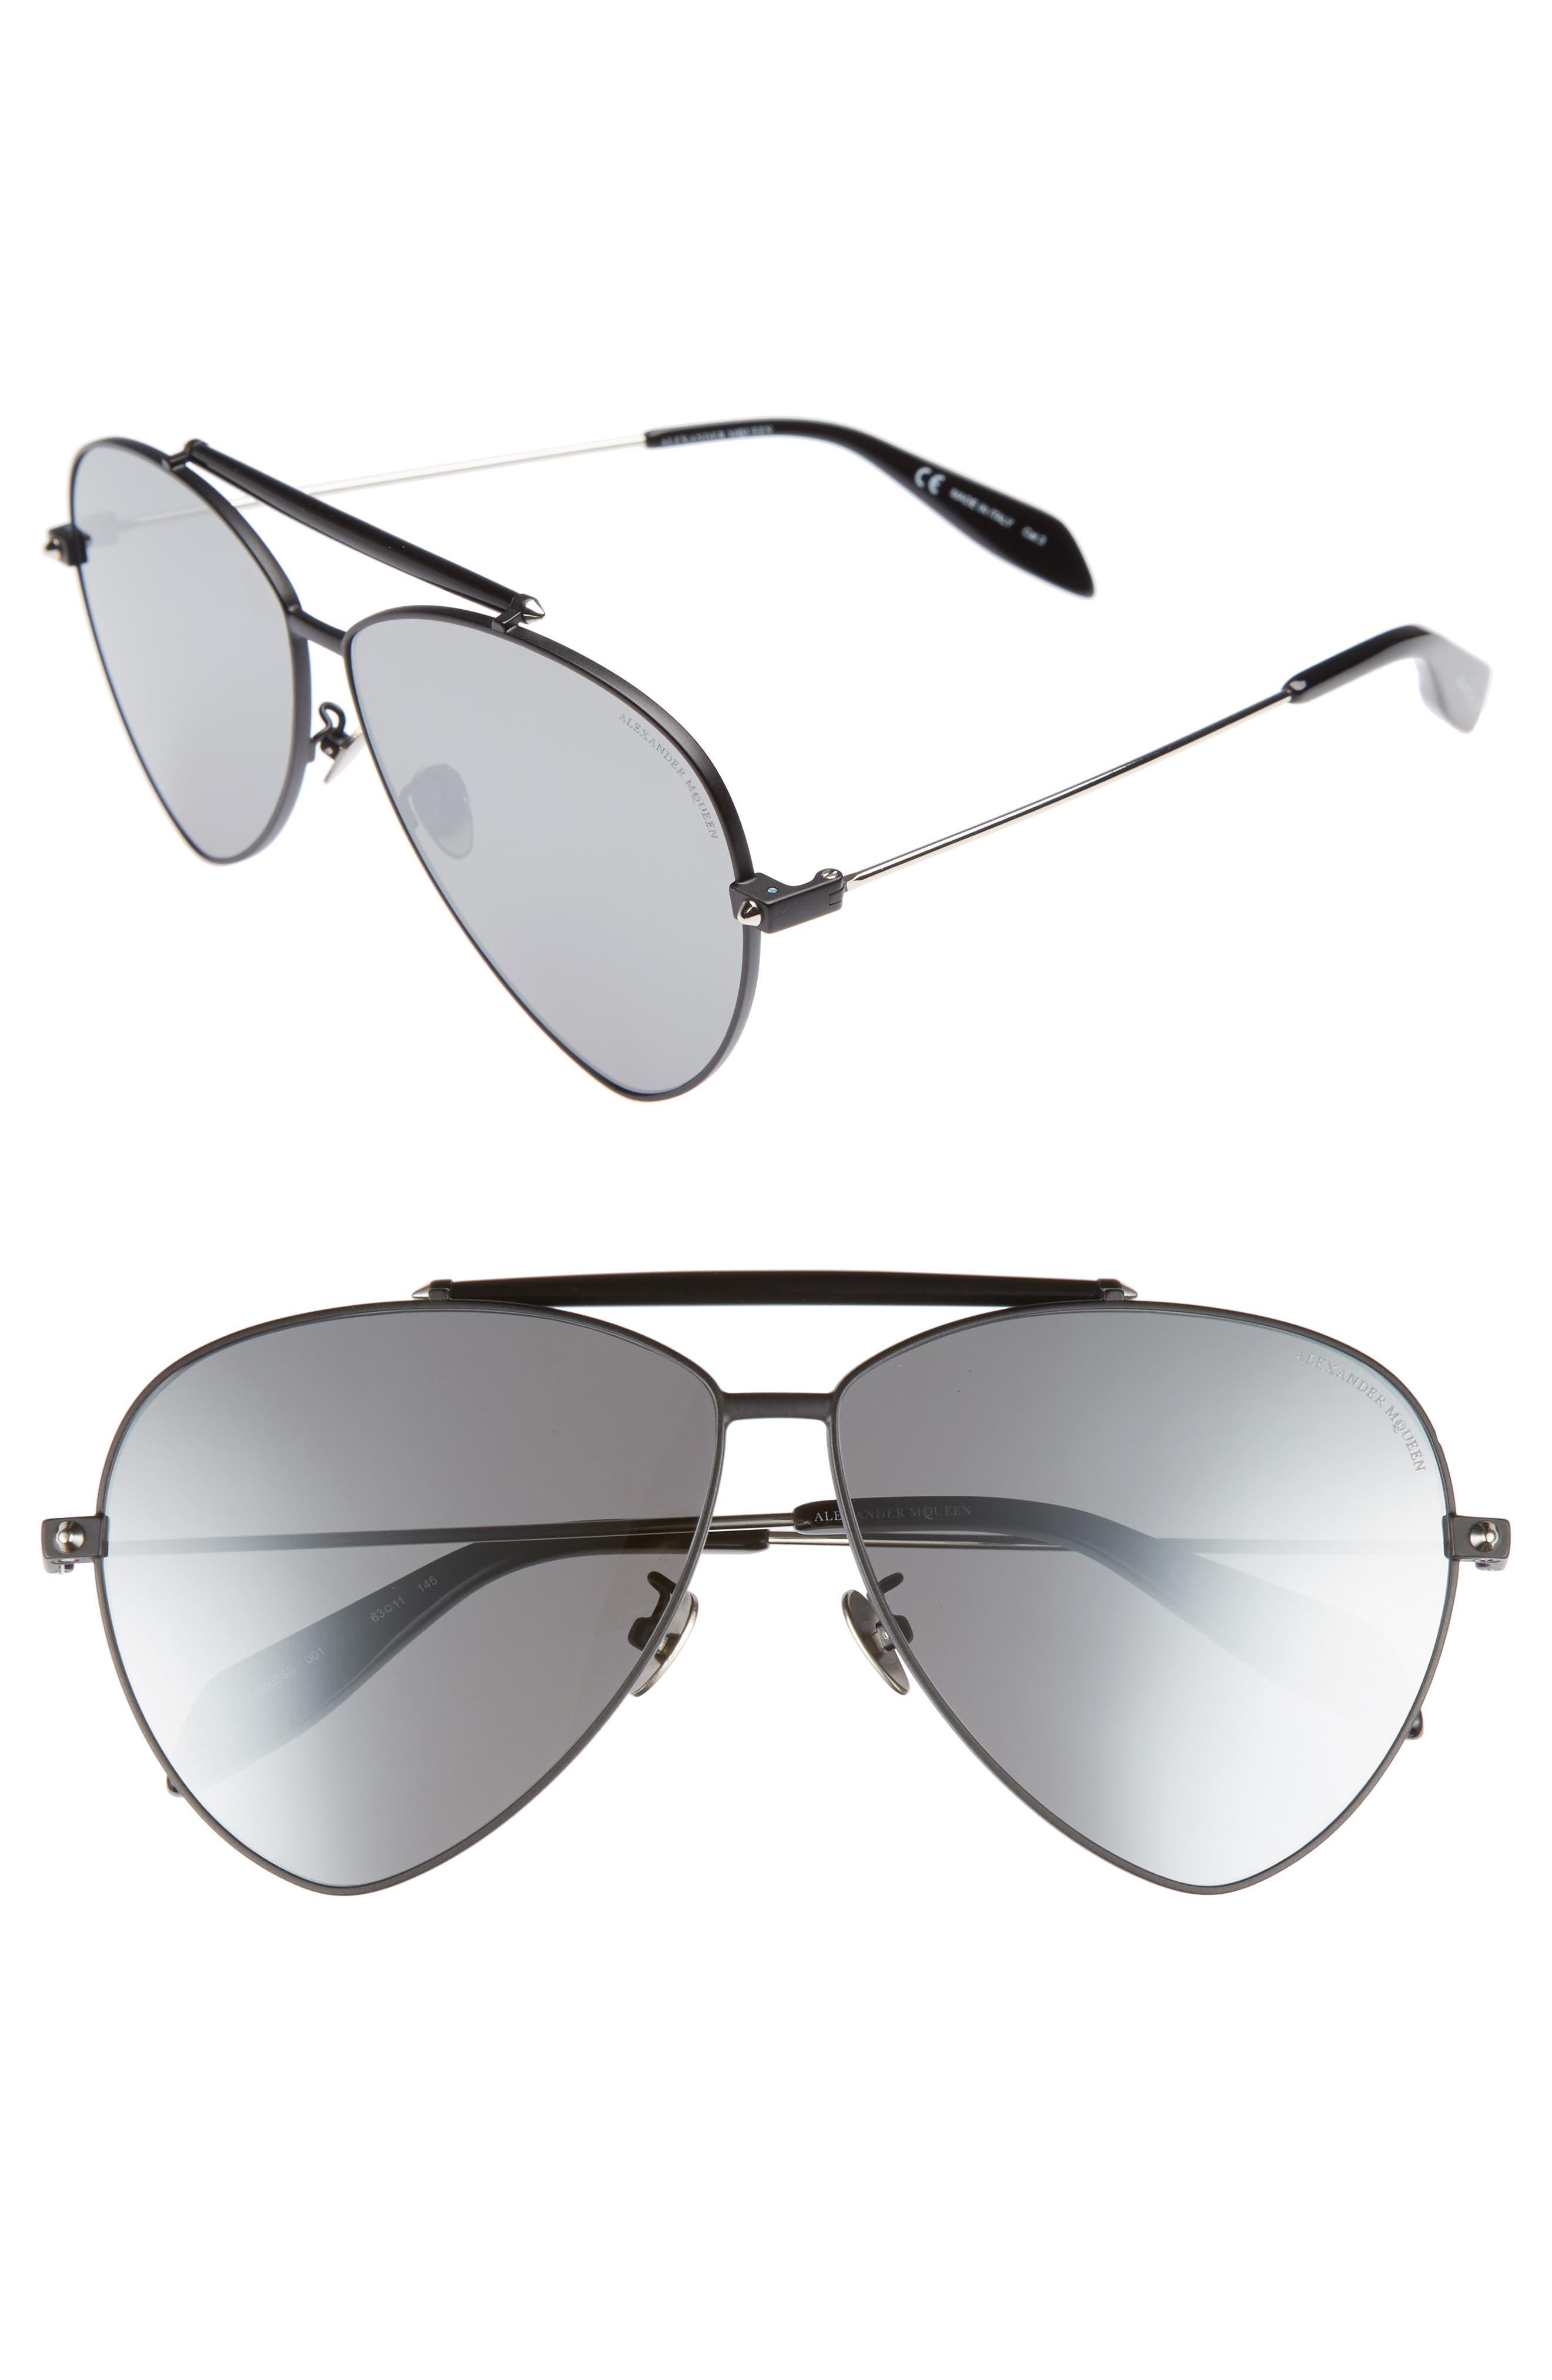 63mm Oversize Aviator Sunglasses,                         Main,                         color,